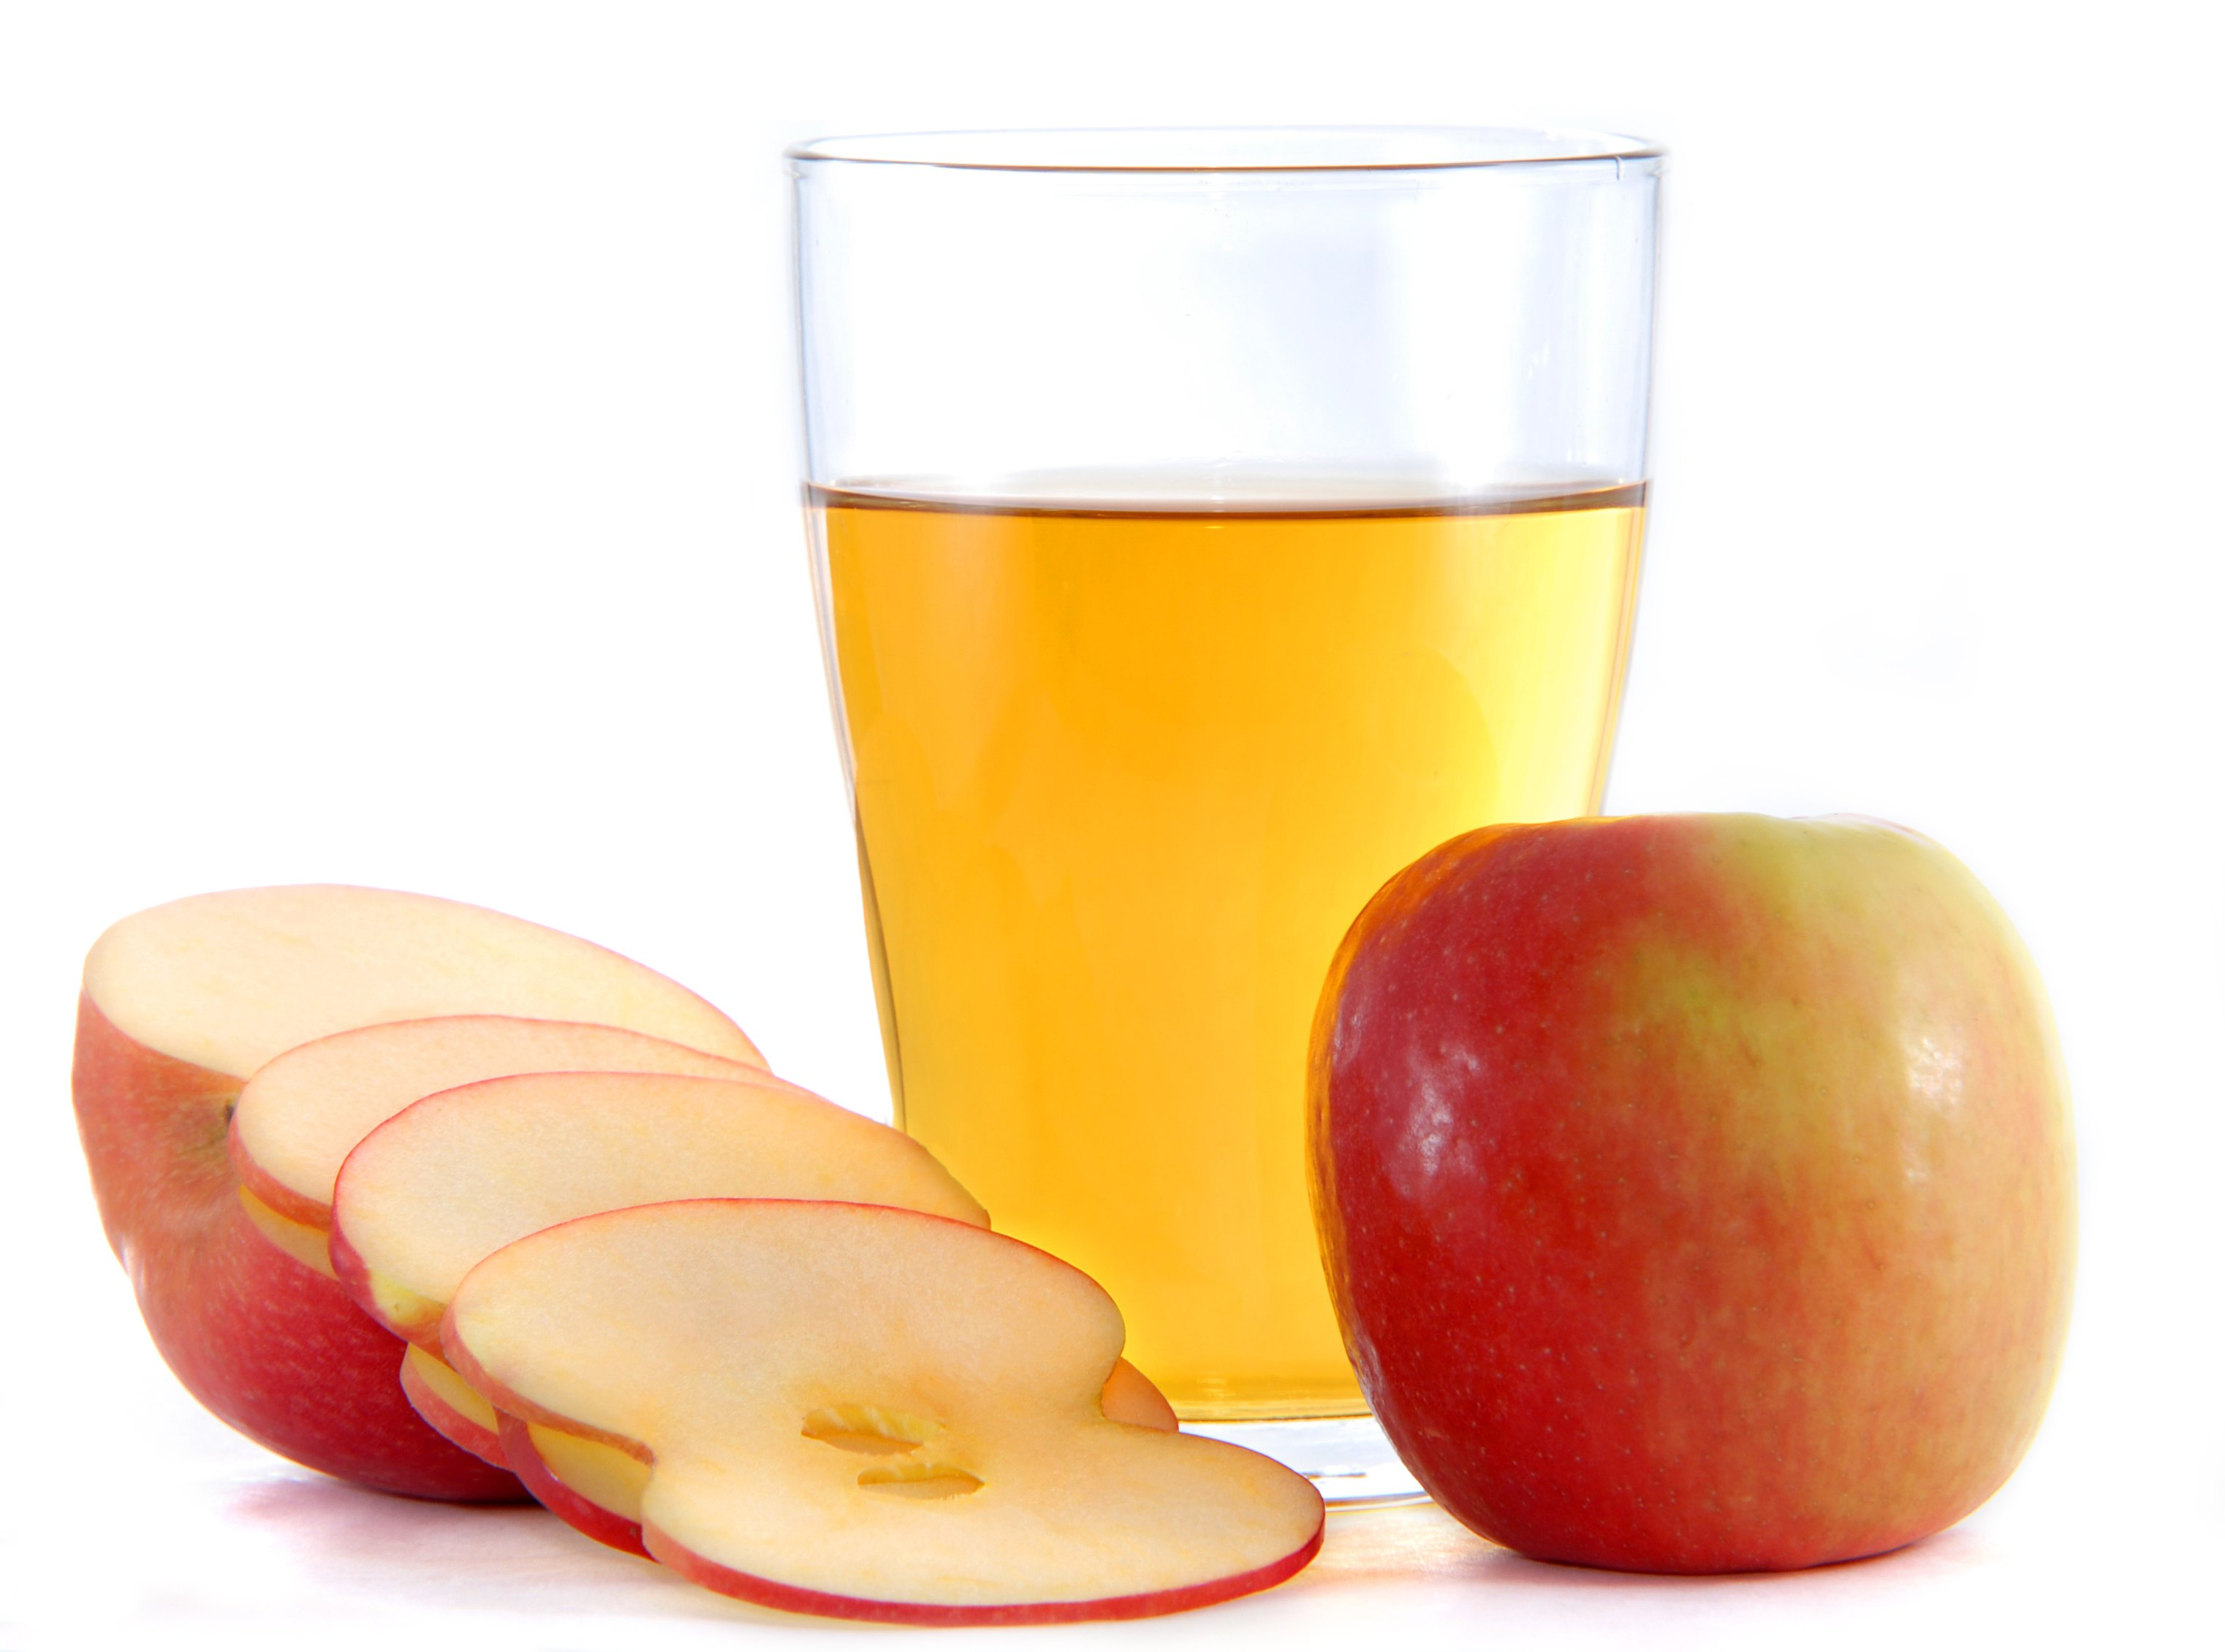 Vinagre de sidra de manzana-Imagen tomada de Wikipedia